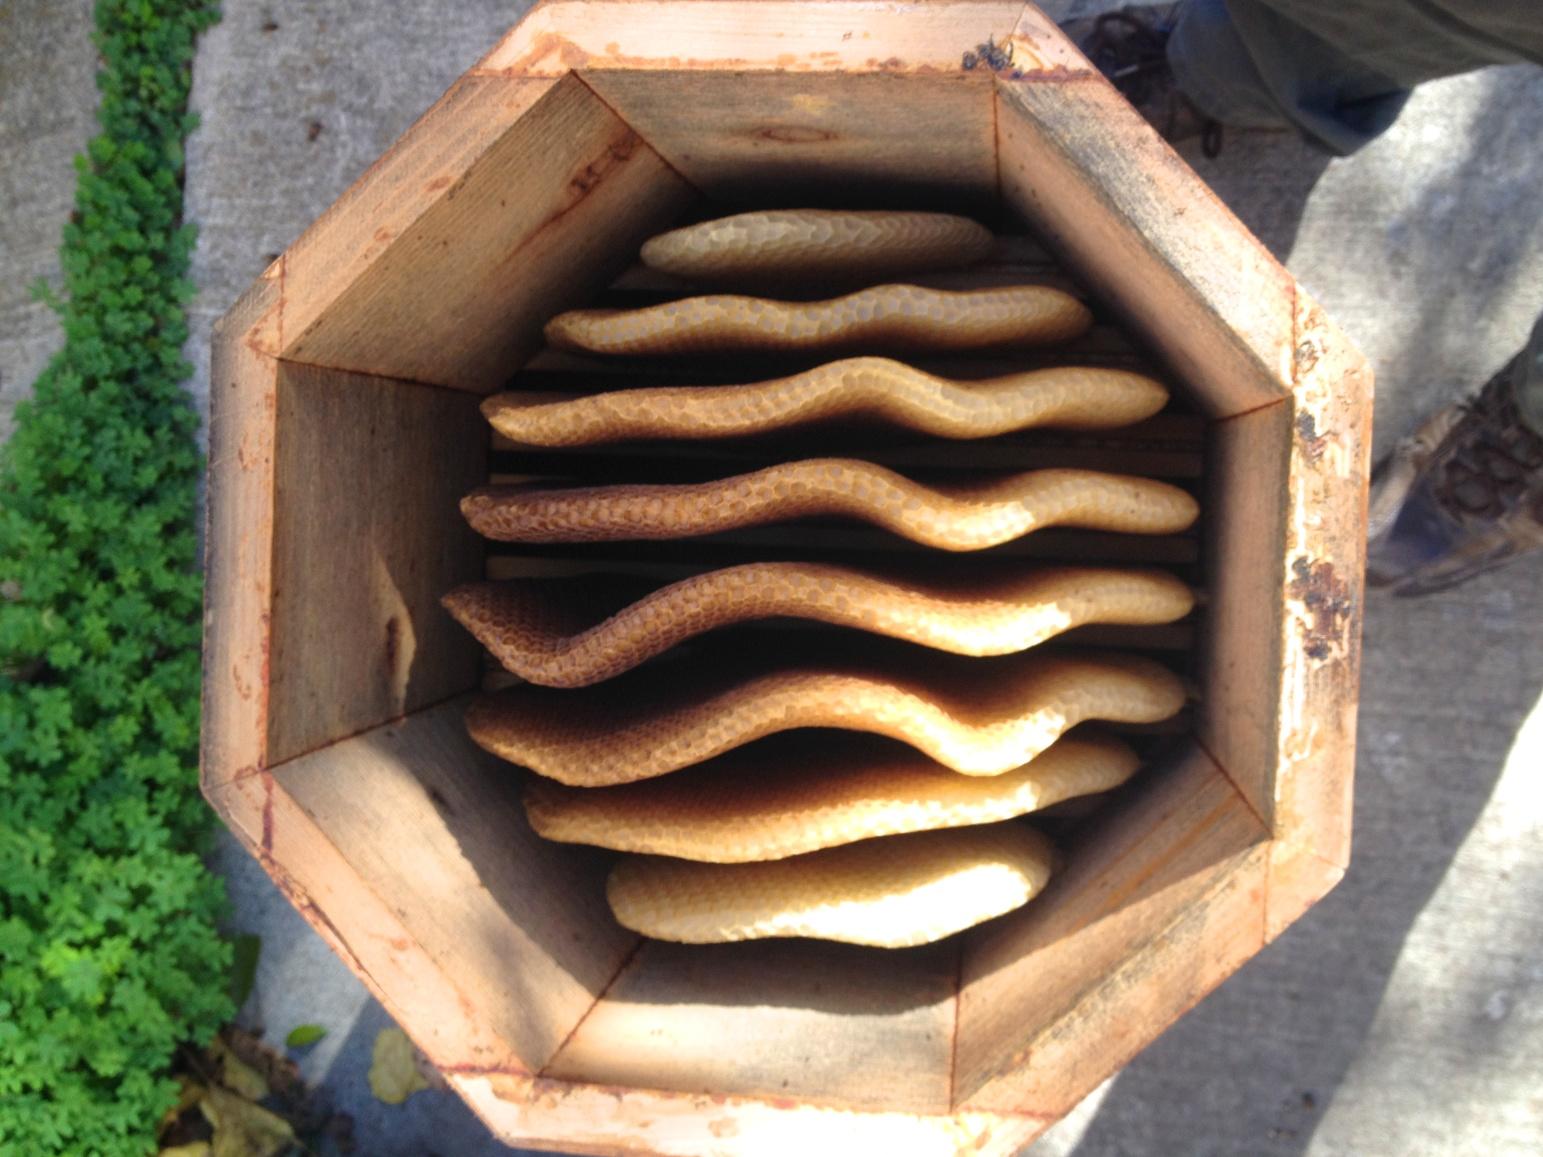 A perished hive.